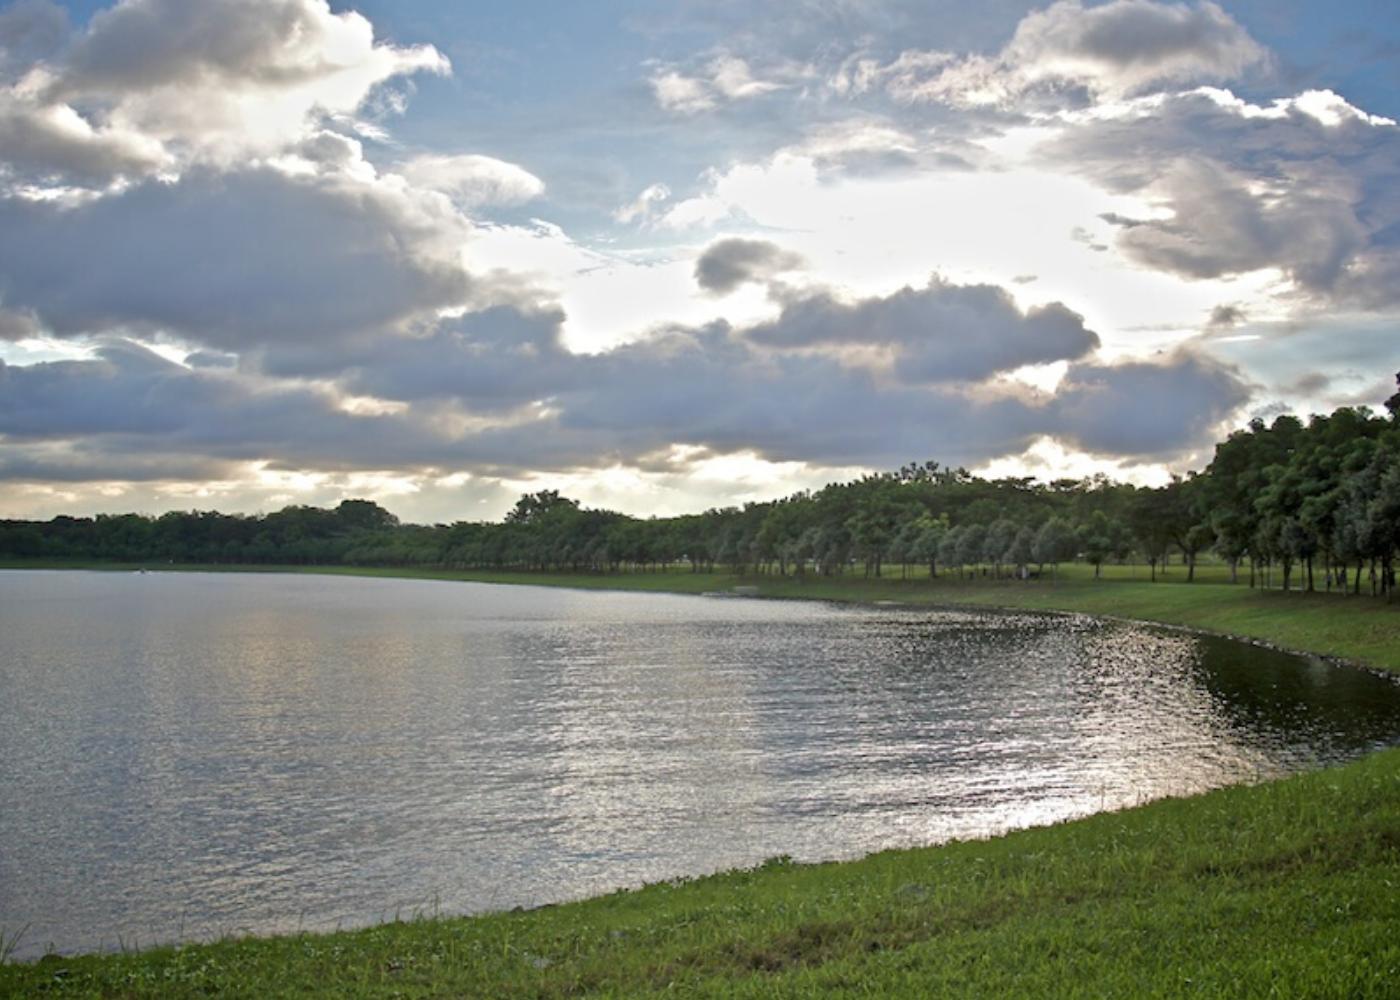 Guide to Bedok: Bedok Reservoir